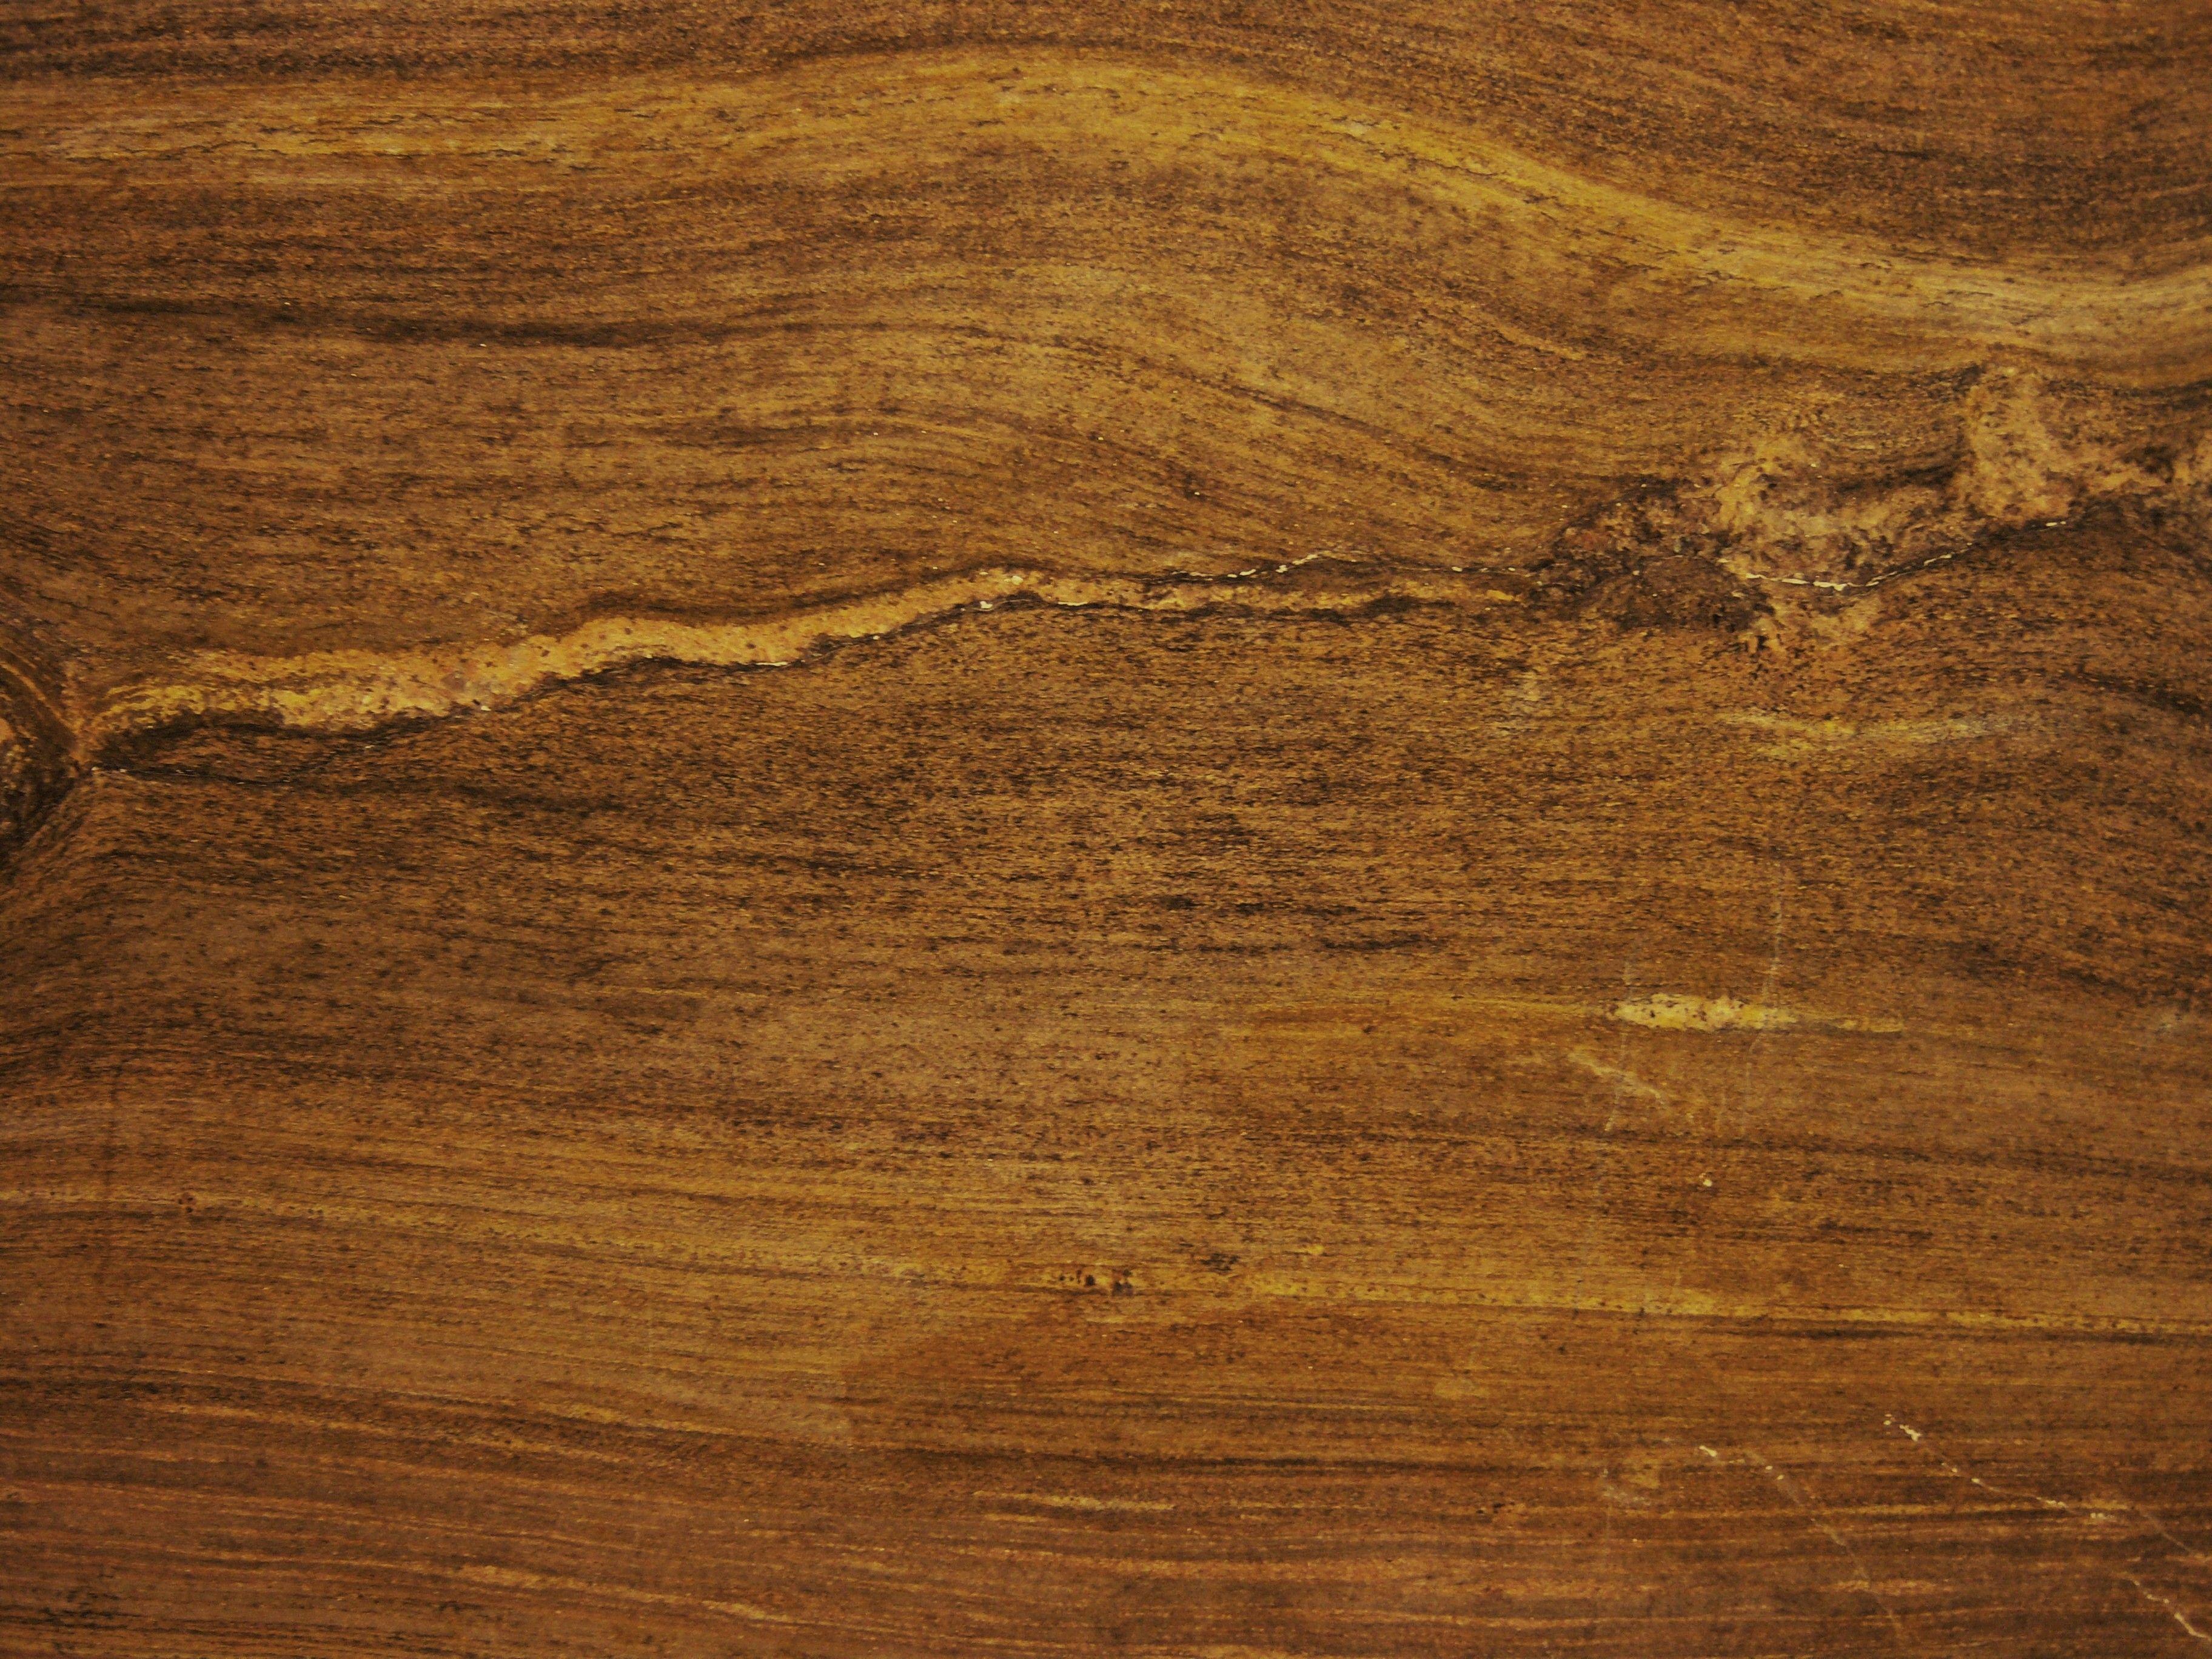 Http Rowanstone Files Wordpress Com 2010 06 Petrified Wood 21 Jpg Petrified Wood Wood Hardwood